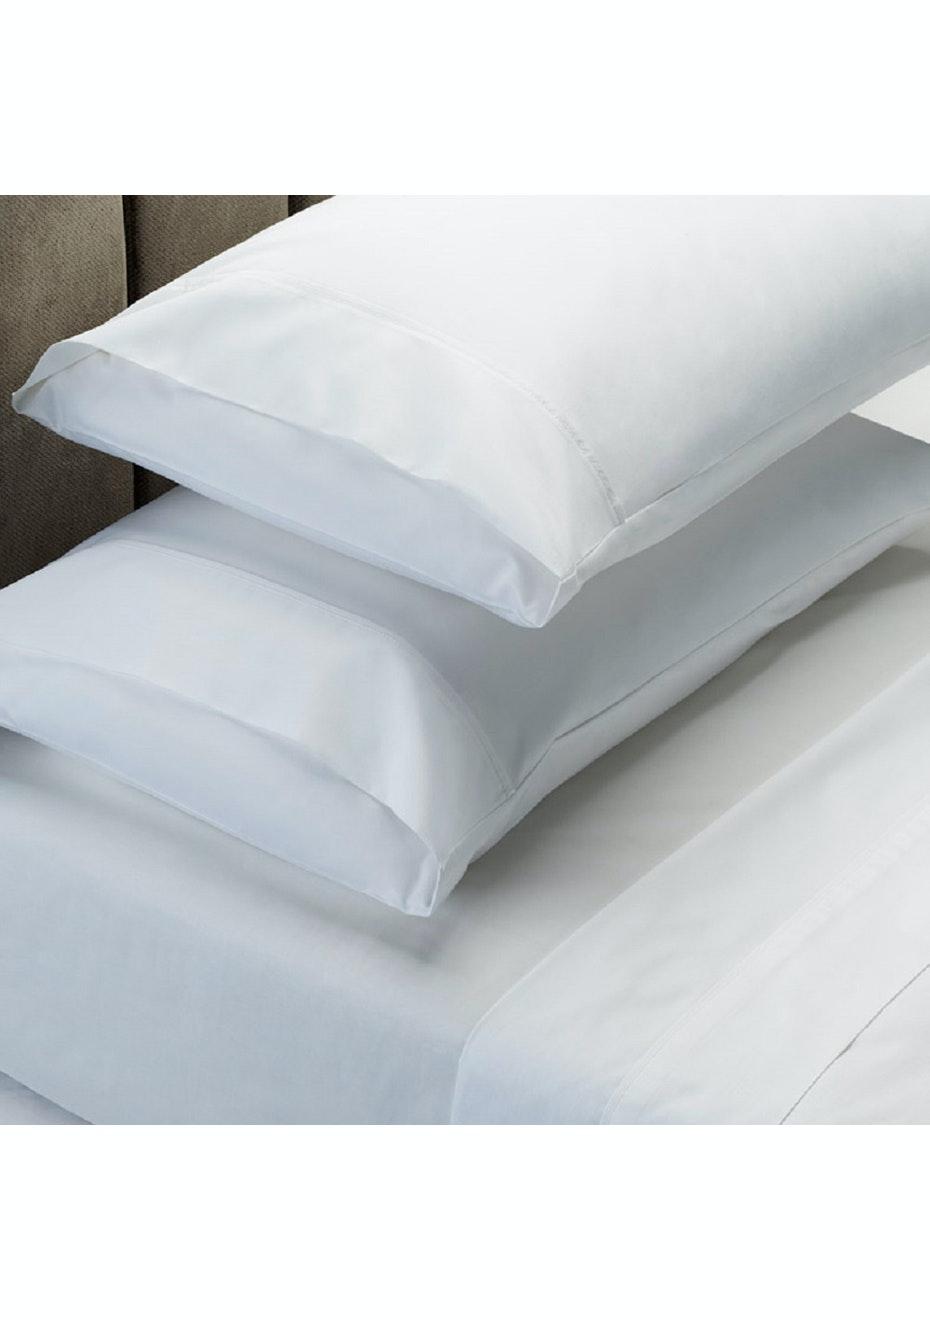 Park Avenue 1000 Thread Count 100% Egyptian Cotton Sheet Sets Queen - White